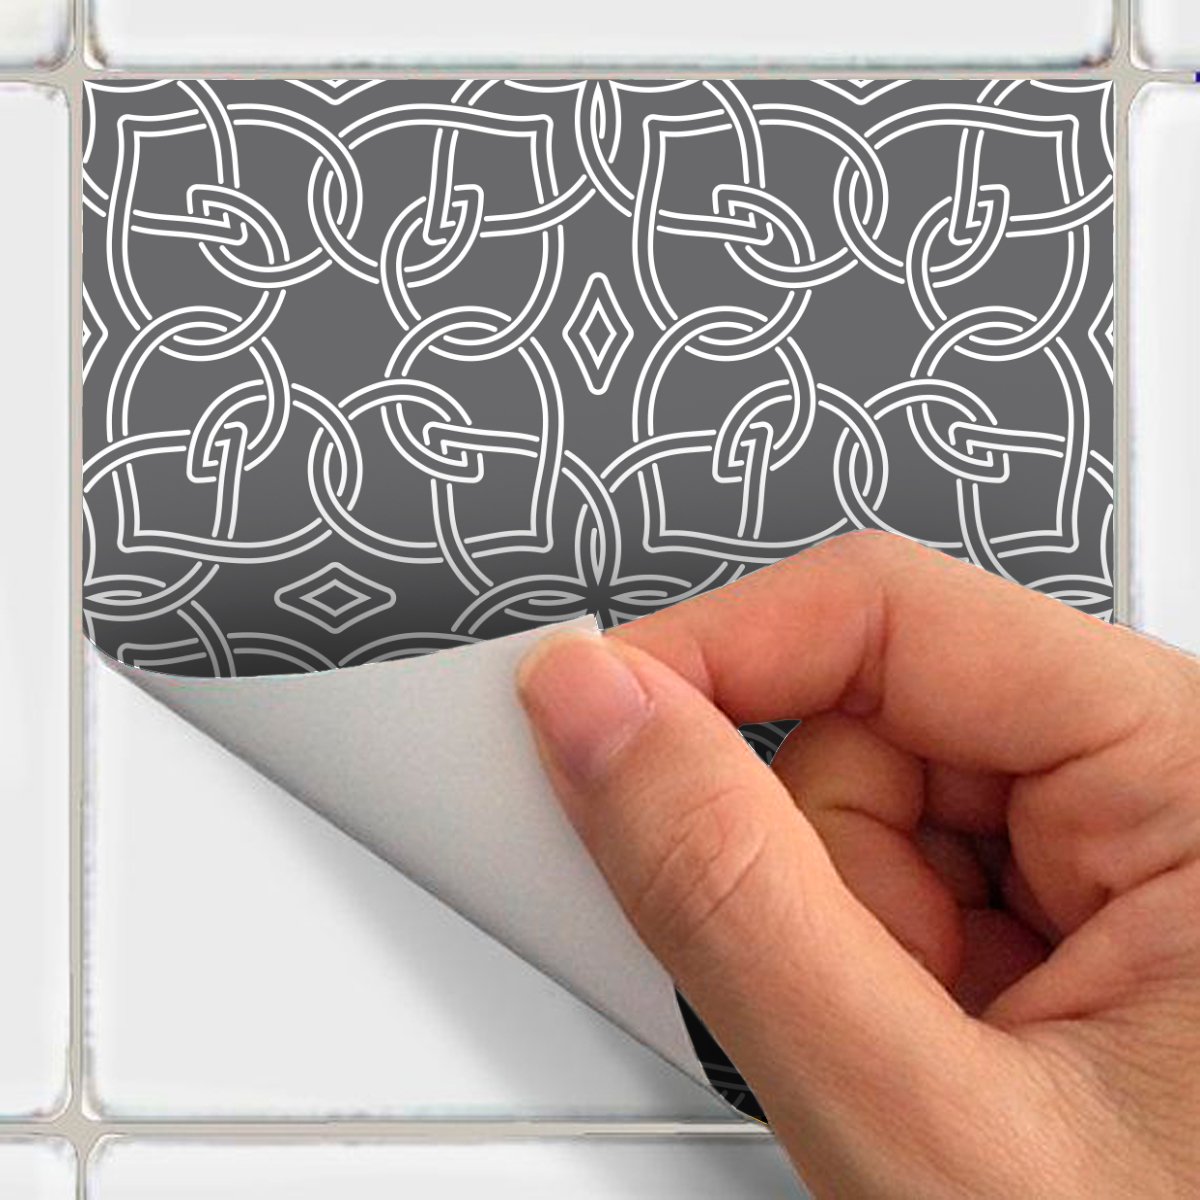 60 stickers carreaux de ciment oriental jerada cuisine carrelages ambiance sticker. Black Bedroom Furniture Sets. Home Design Ideas